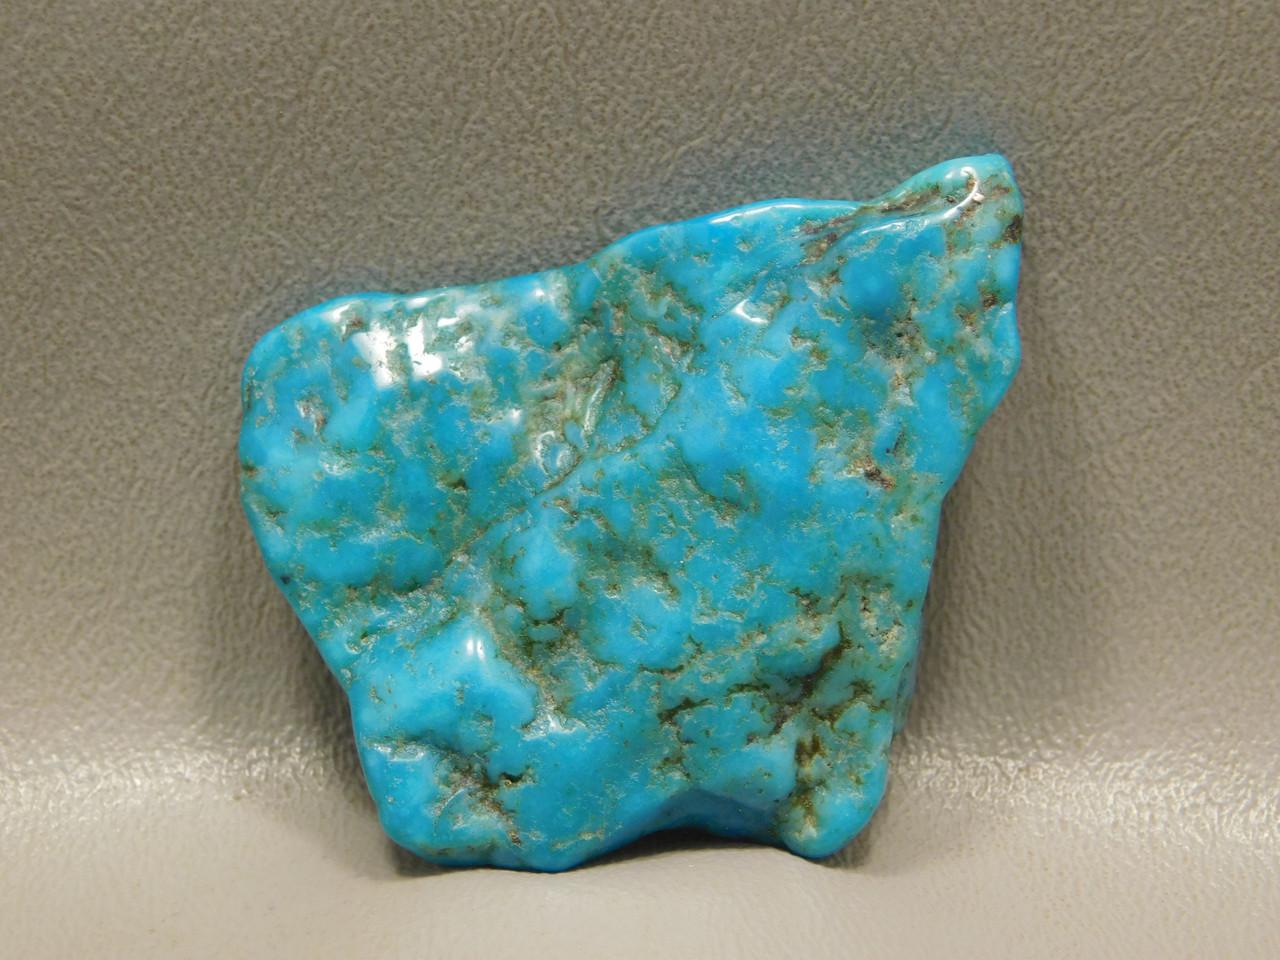 Large Tumble Polished Naco Turquoise Nugget Natural Cabochon #N8